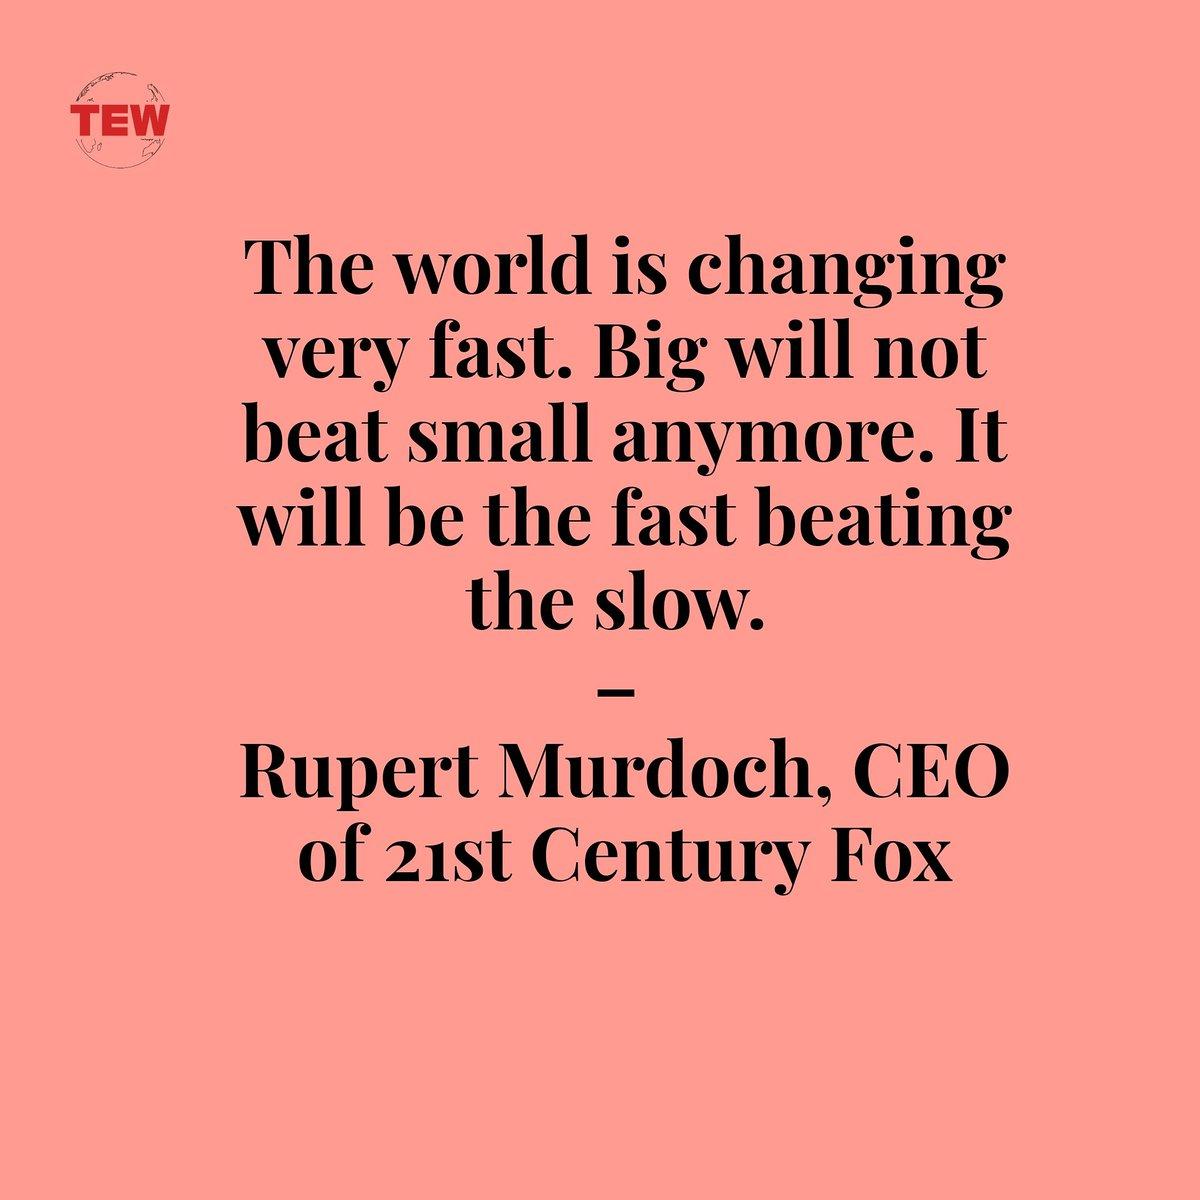 #quoteoftheday #DailyInspiration #CEO #ceoquotes #quotes #businessquotes #business #ceomindset #dailyquotes #entrepreneurlifepic.twitter.com/zplyO29CDo